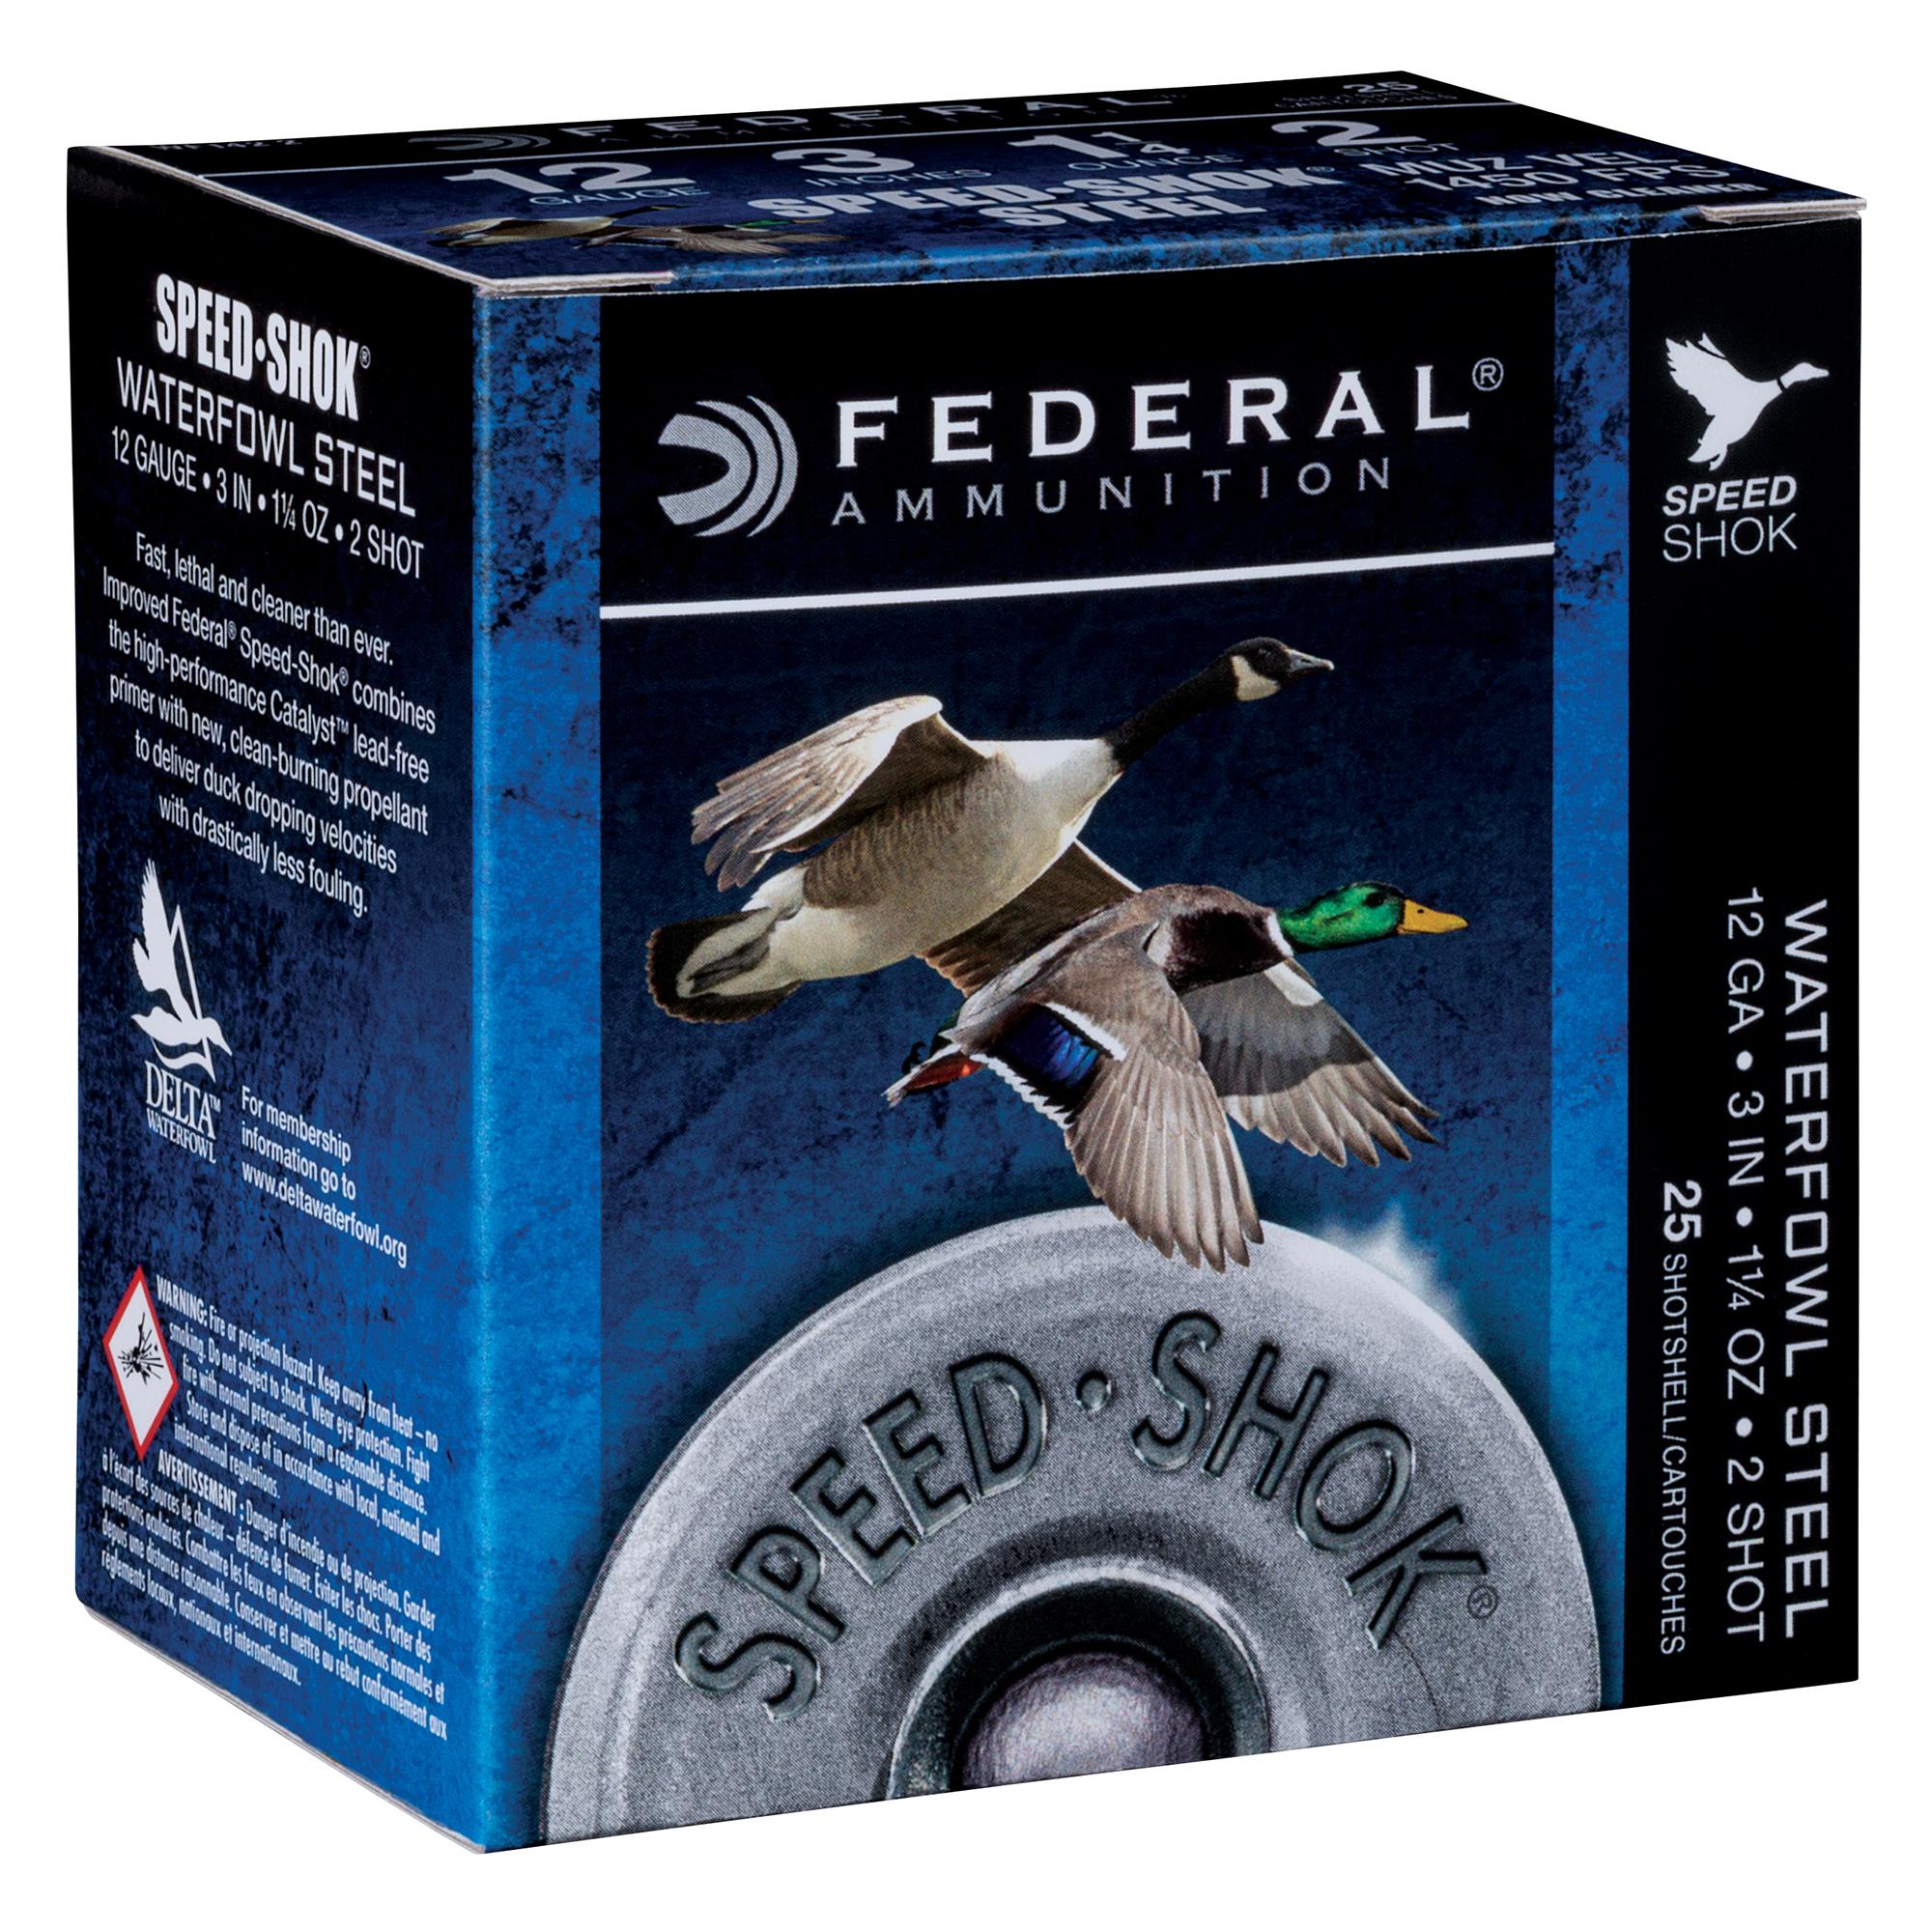 "Federal Premium Speed-Shok Steel Waterfowl Loads, 12-ga., 2-3/4"", 1-1/8 oz., 4"